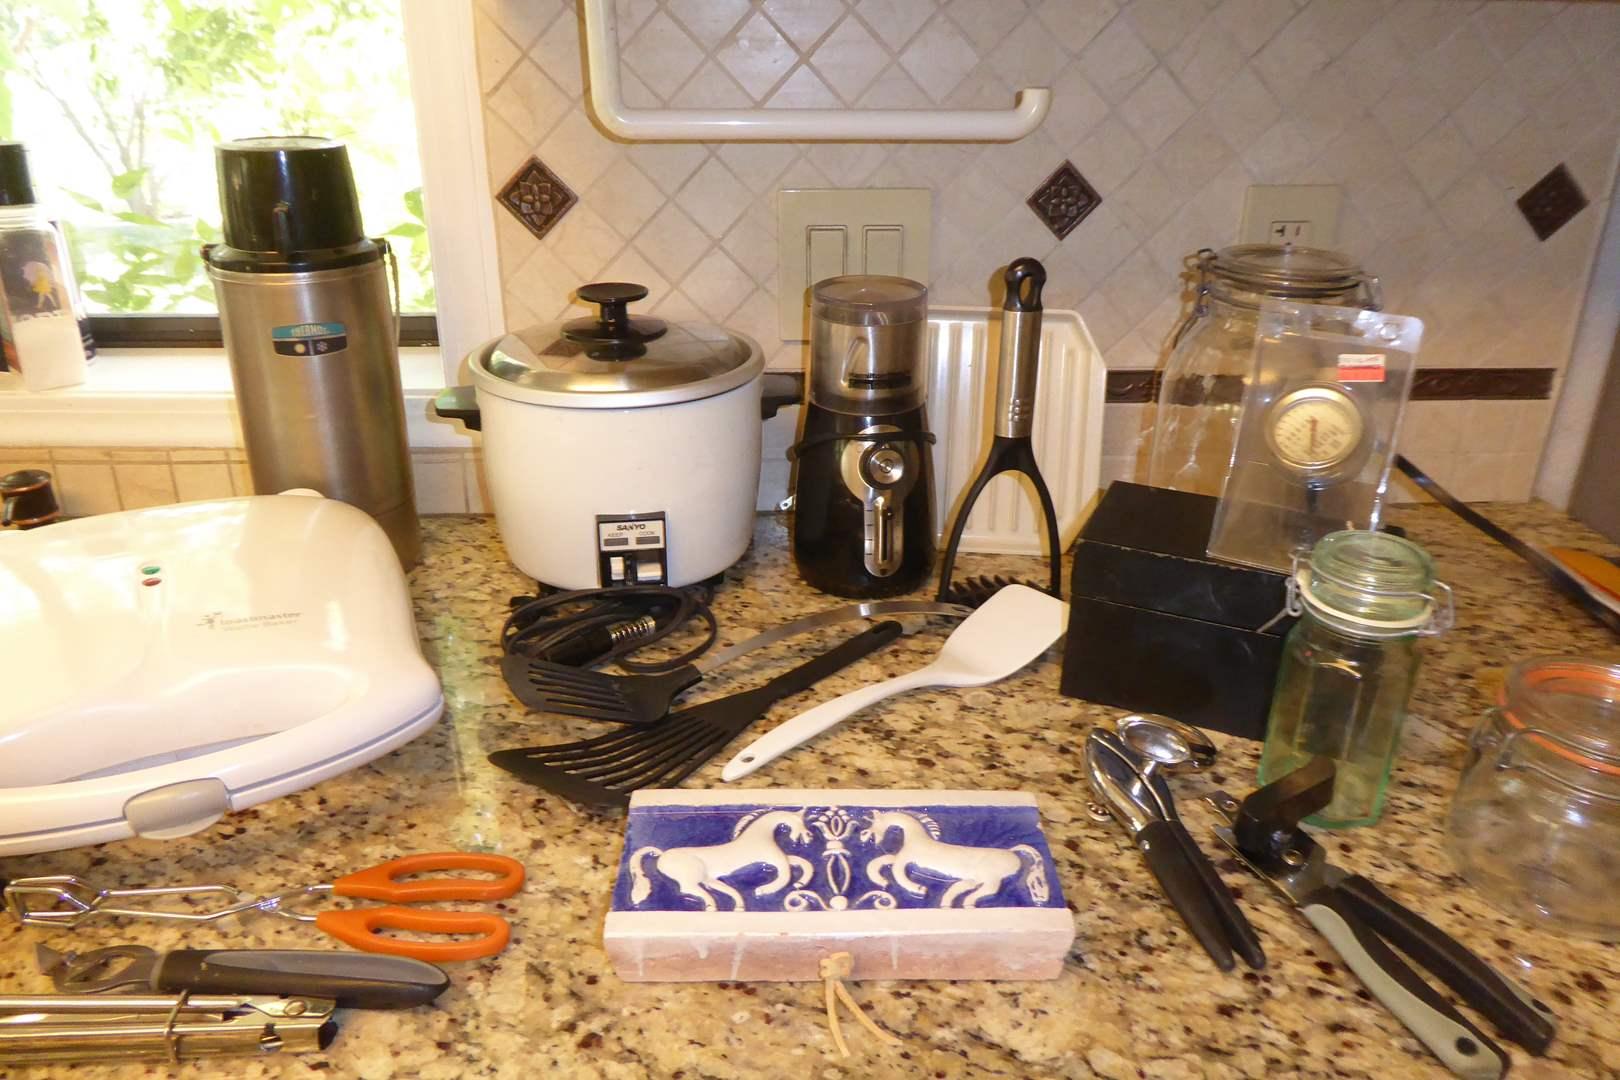 Lot # 13 - Sanyo Rice Cooker, Waffle Maker, Coffee Grinder & Cute Ceramic Horse Hanging  (main image)